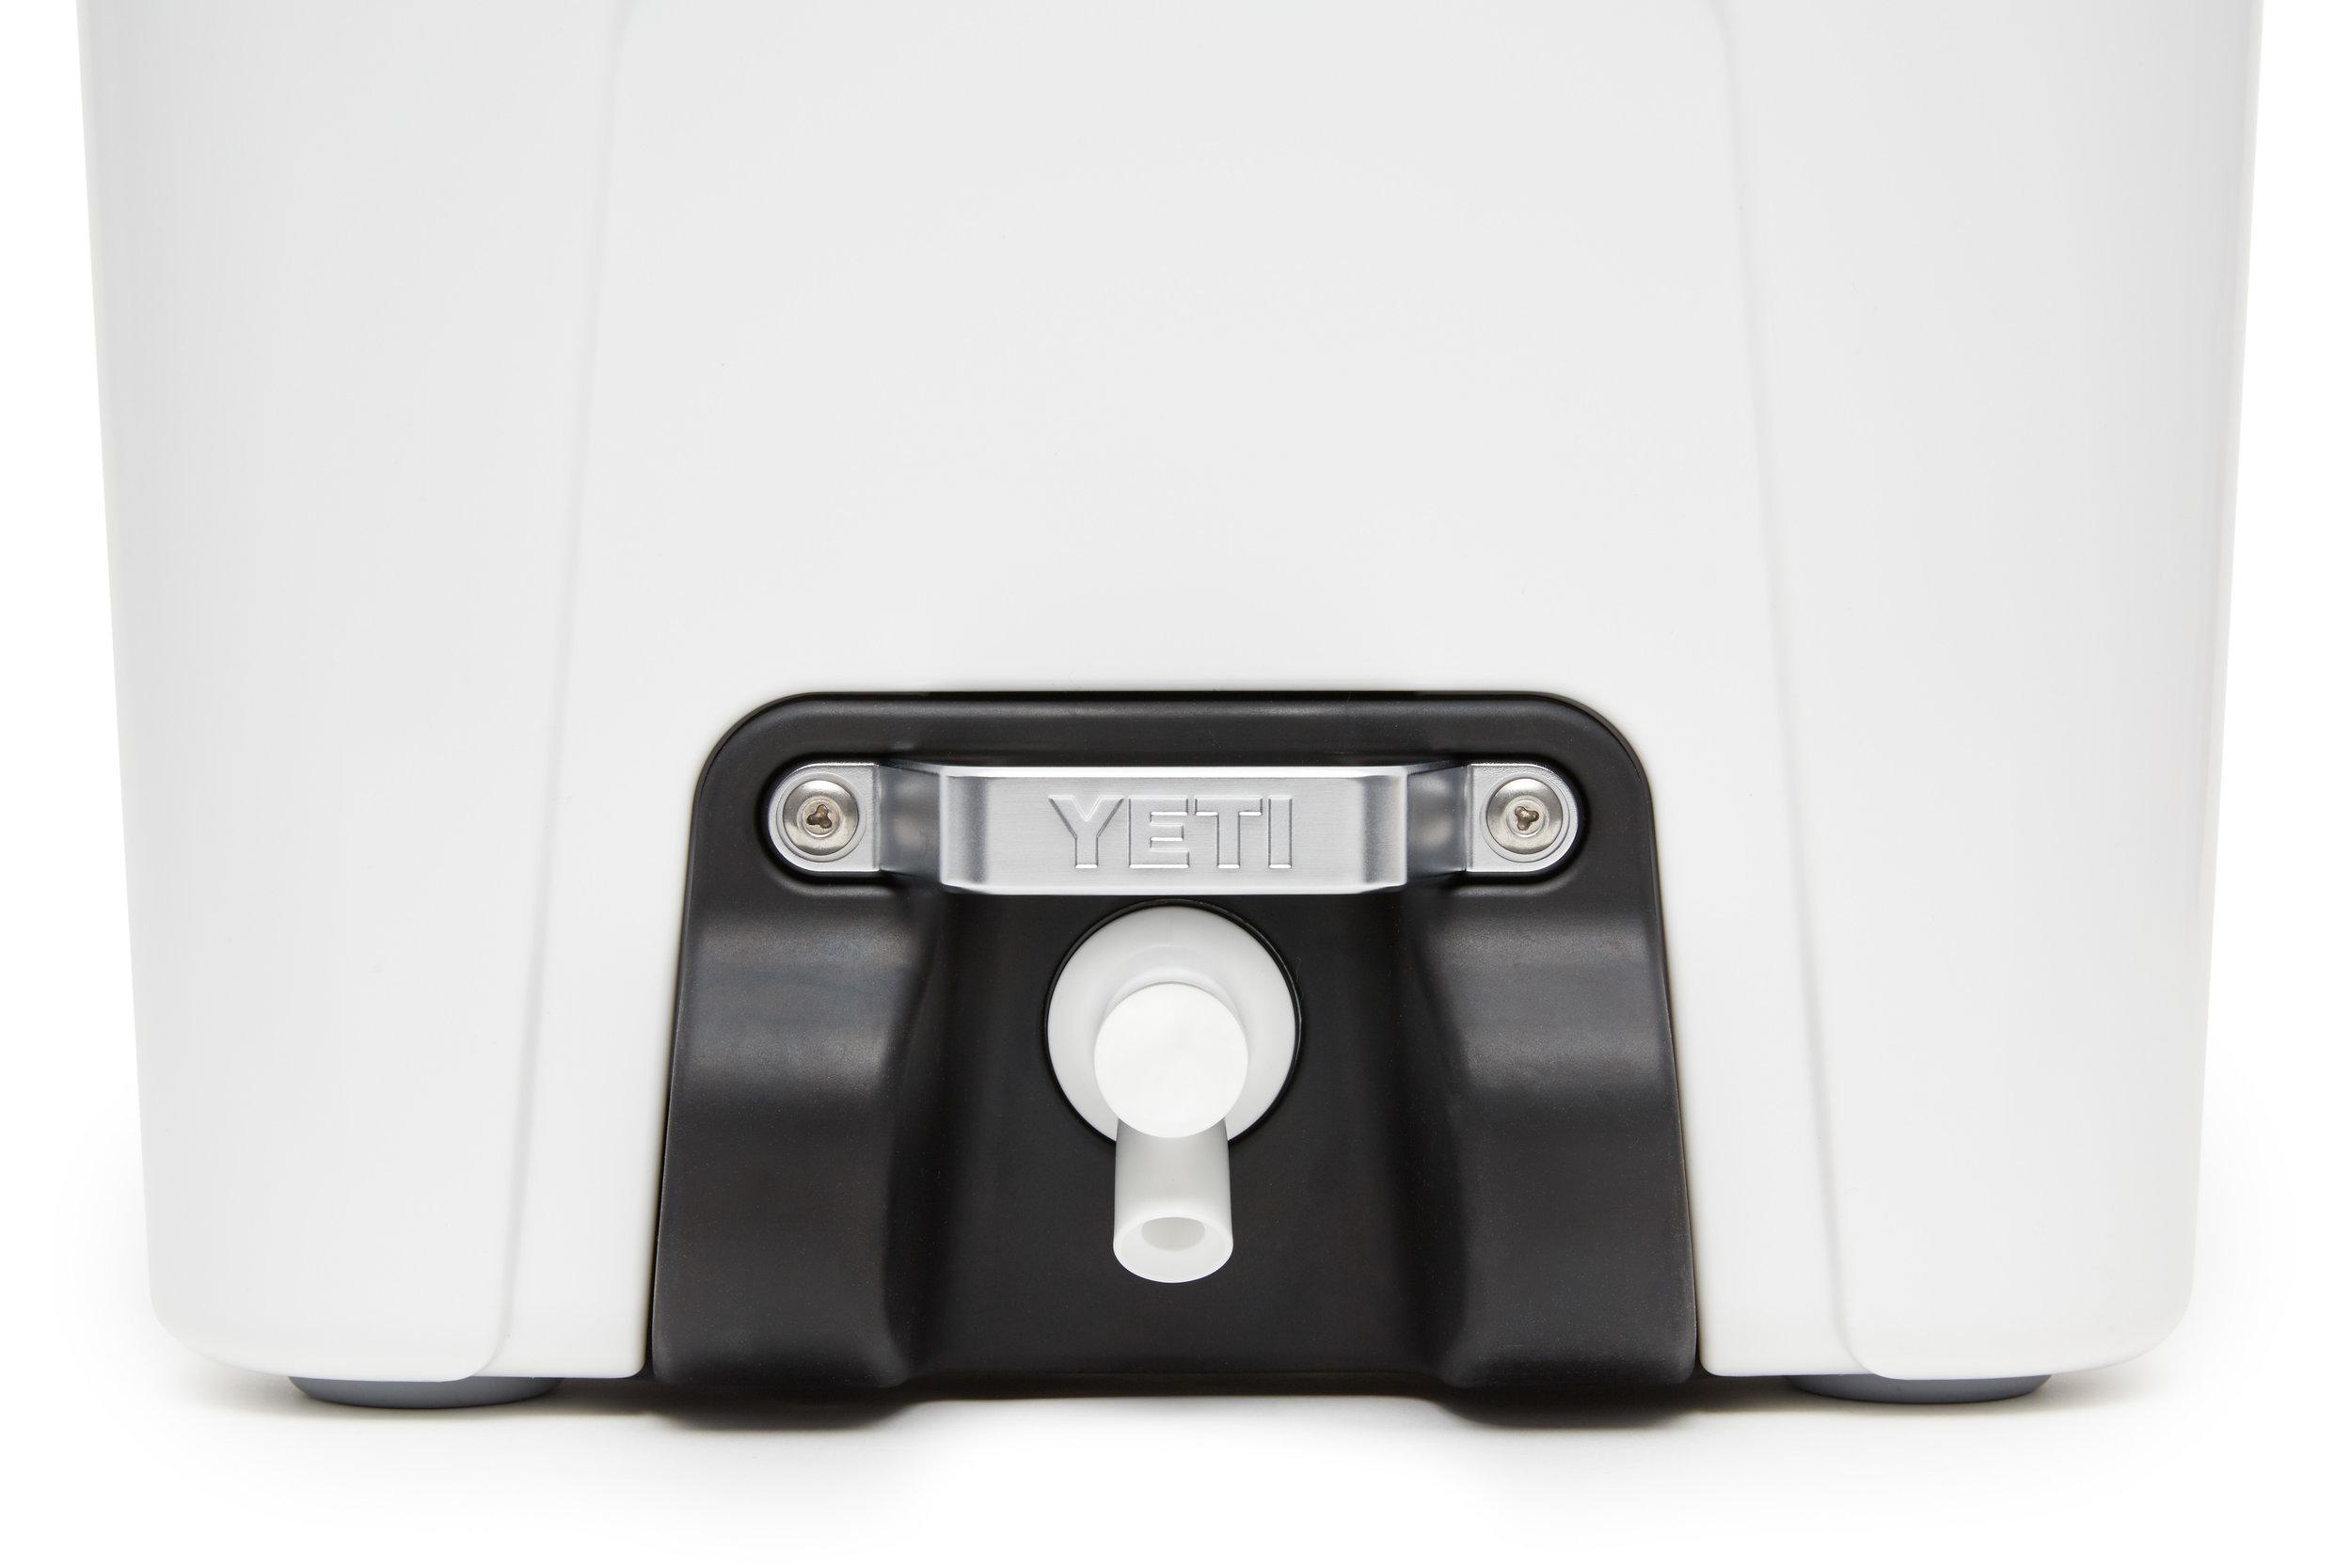 YETI_20180216_Product_Silo_White_Close-Up_Spigot-Sure-Grip-Handle.jpg